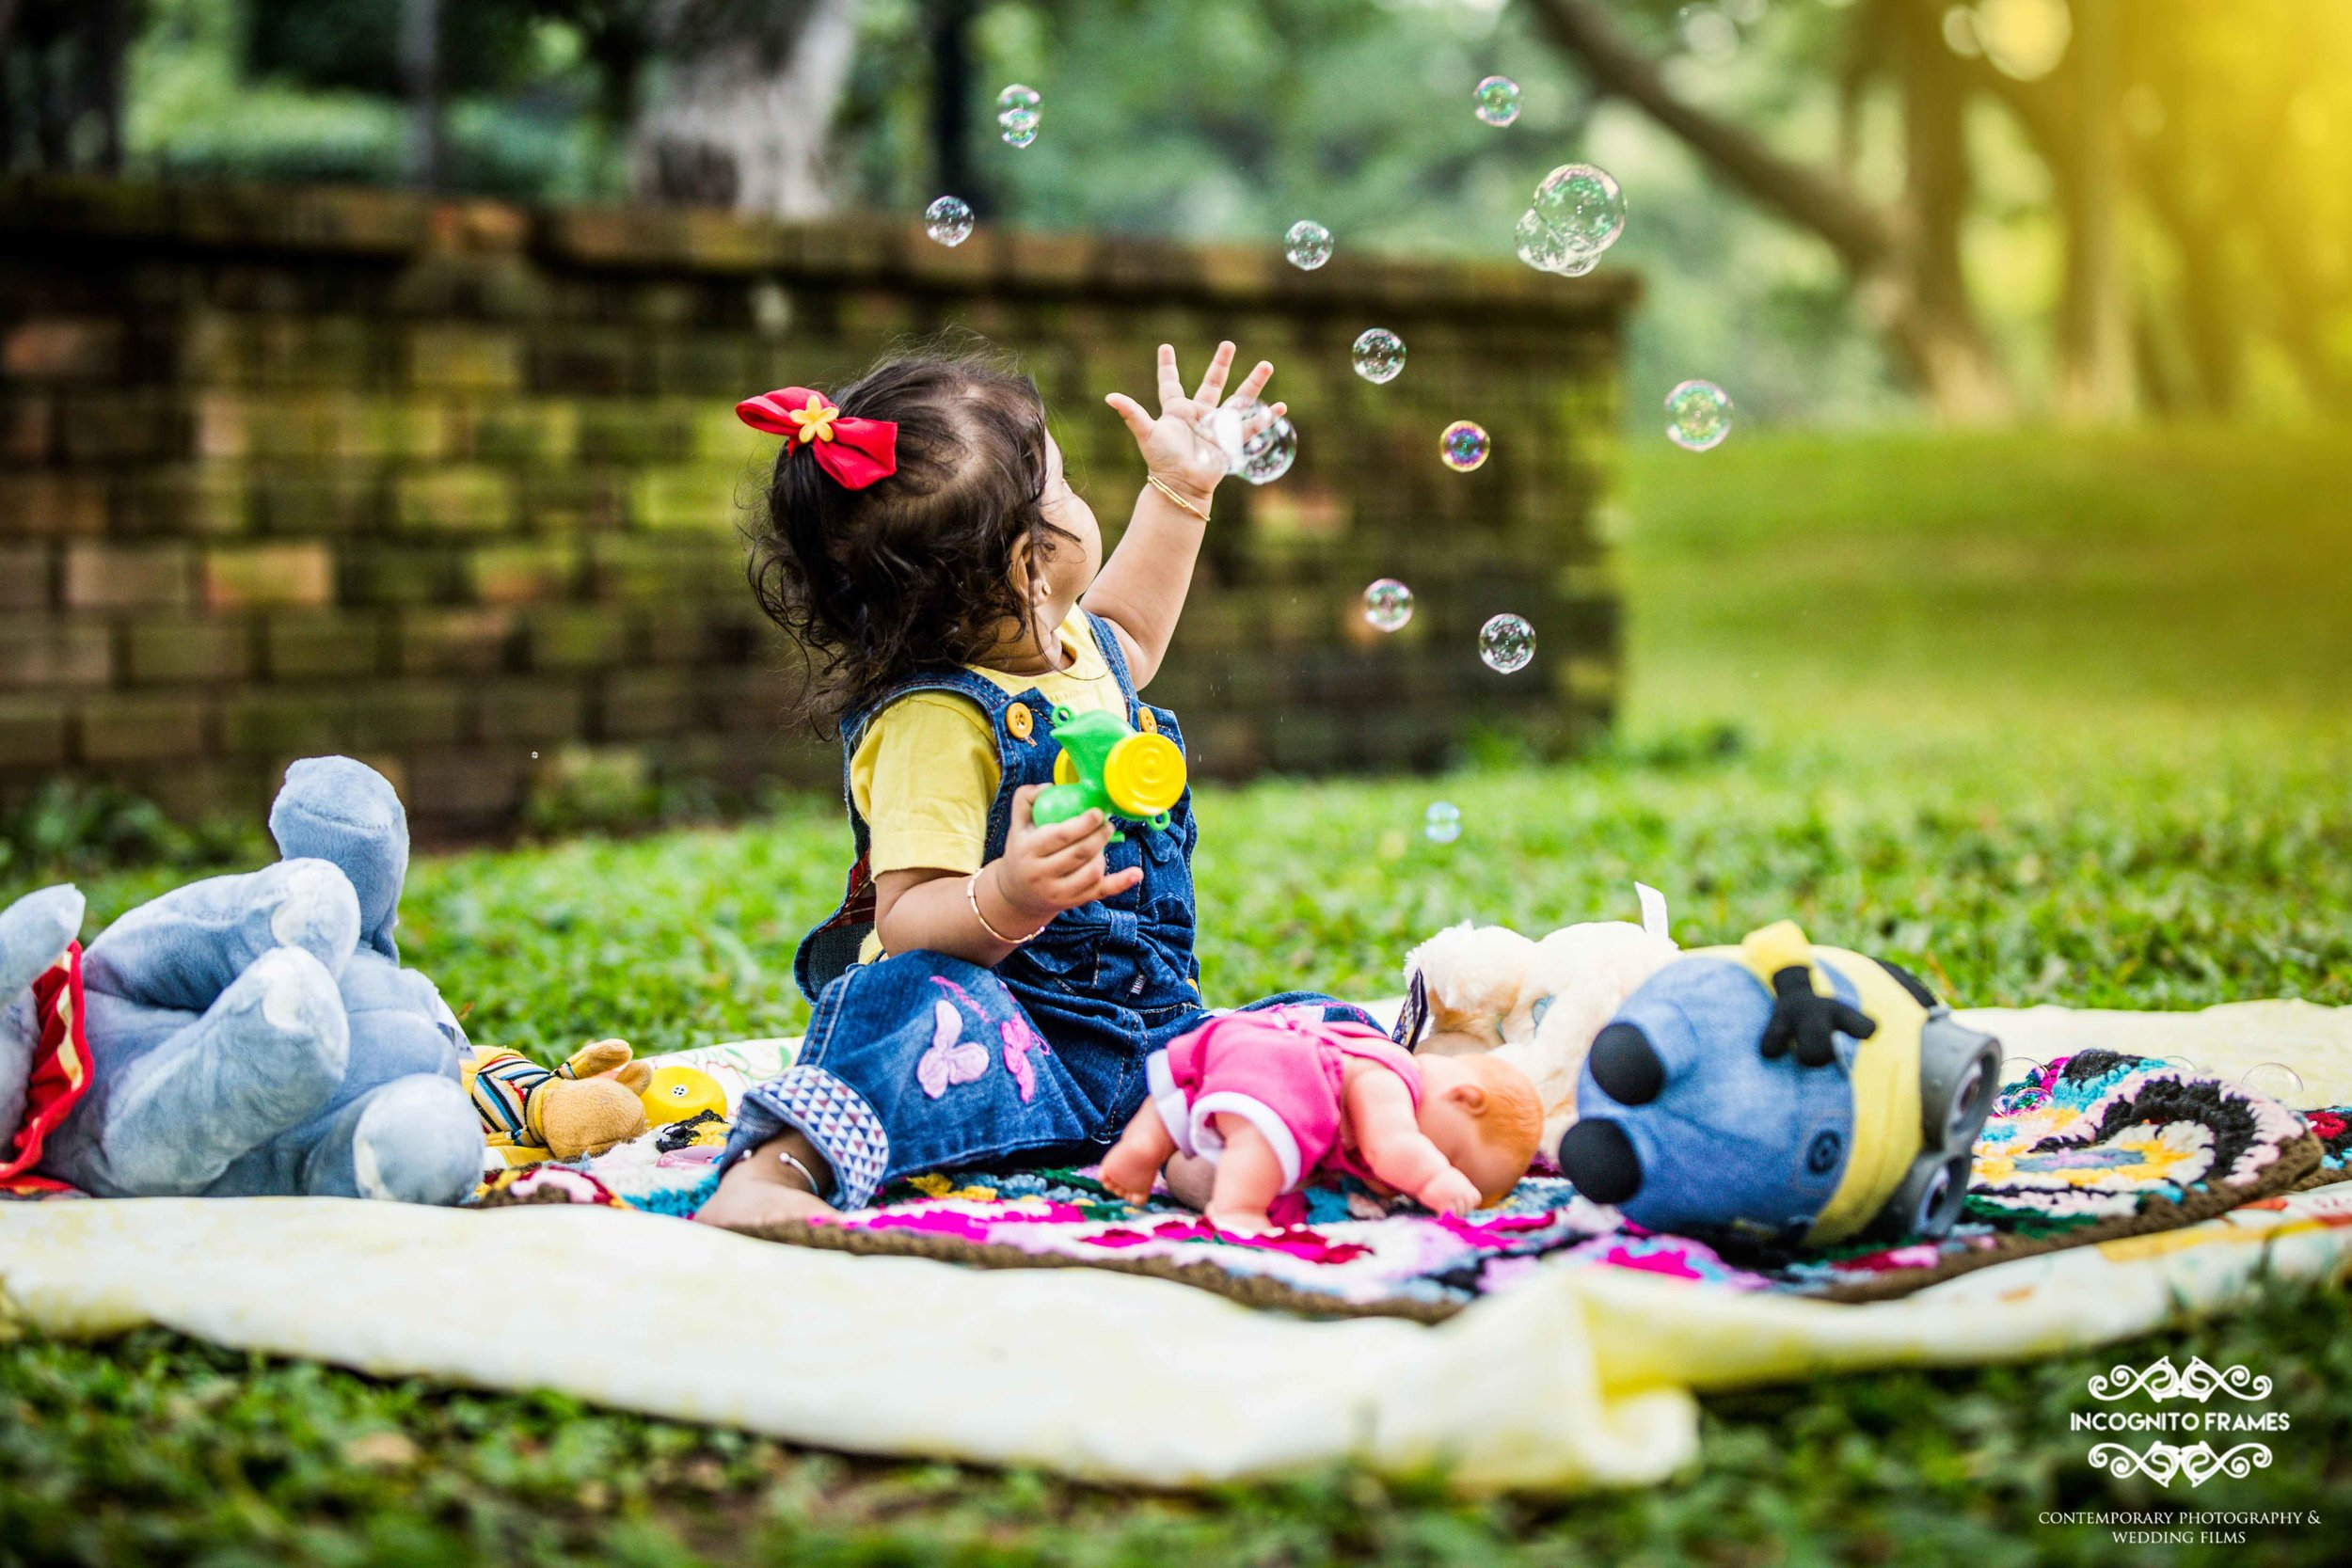 kidsphotographyinchennai.jpg